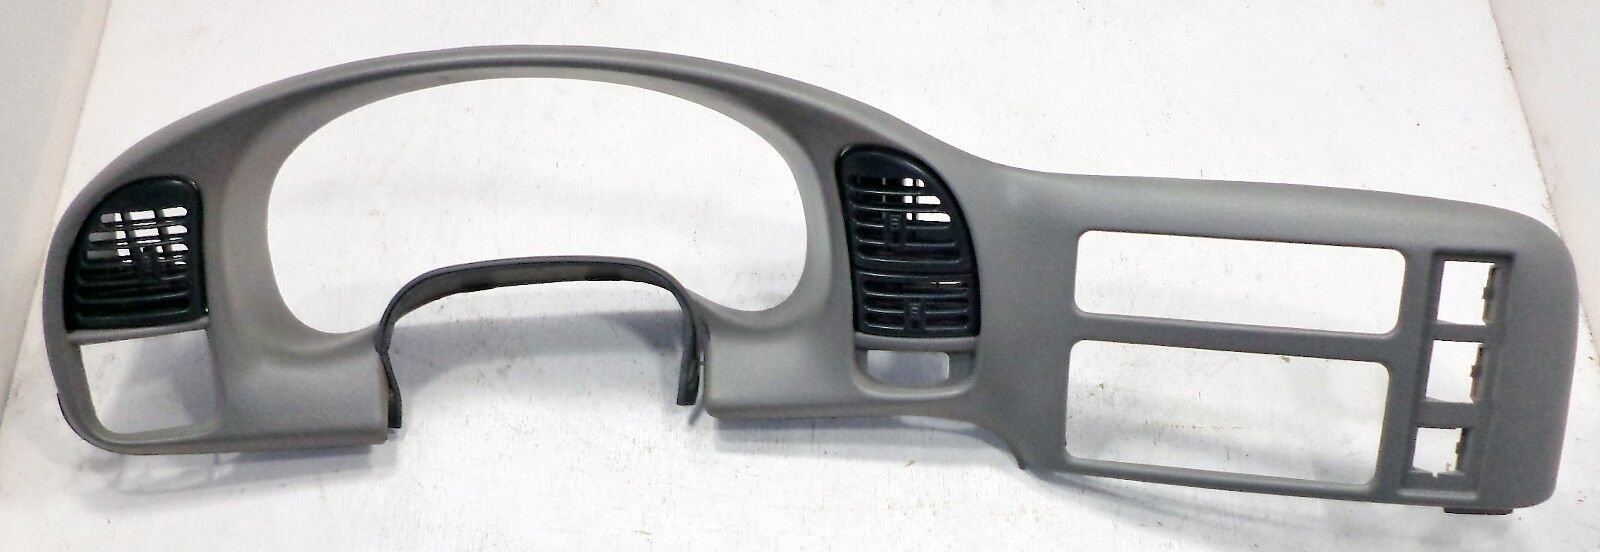 Used Gmc Dash Parts For Sale 93 Safari Fuse Diagrams 1996 2005 Chevy Astro Van Bezel Instrument Panel Gray Grey Nice